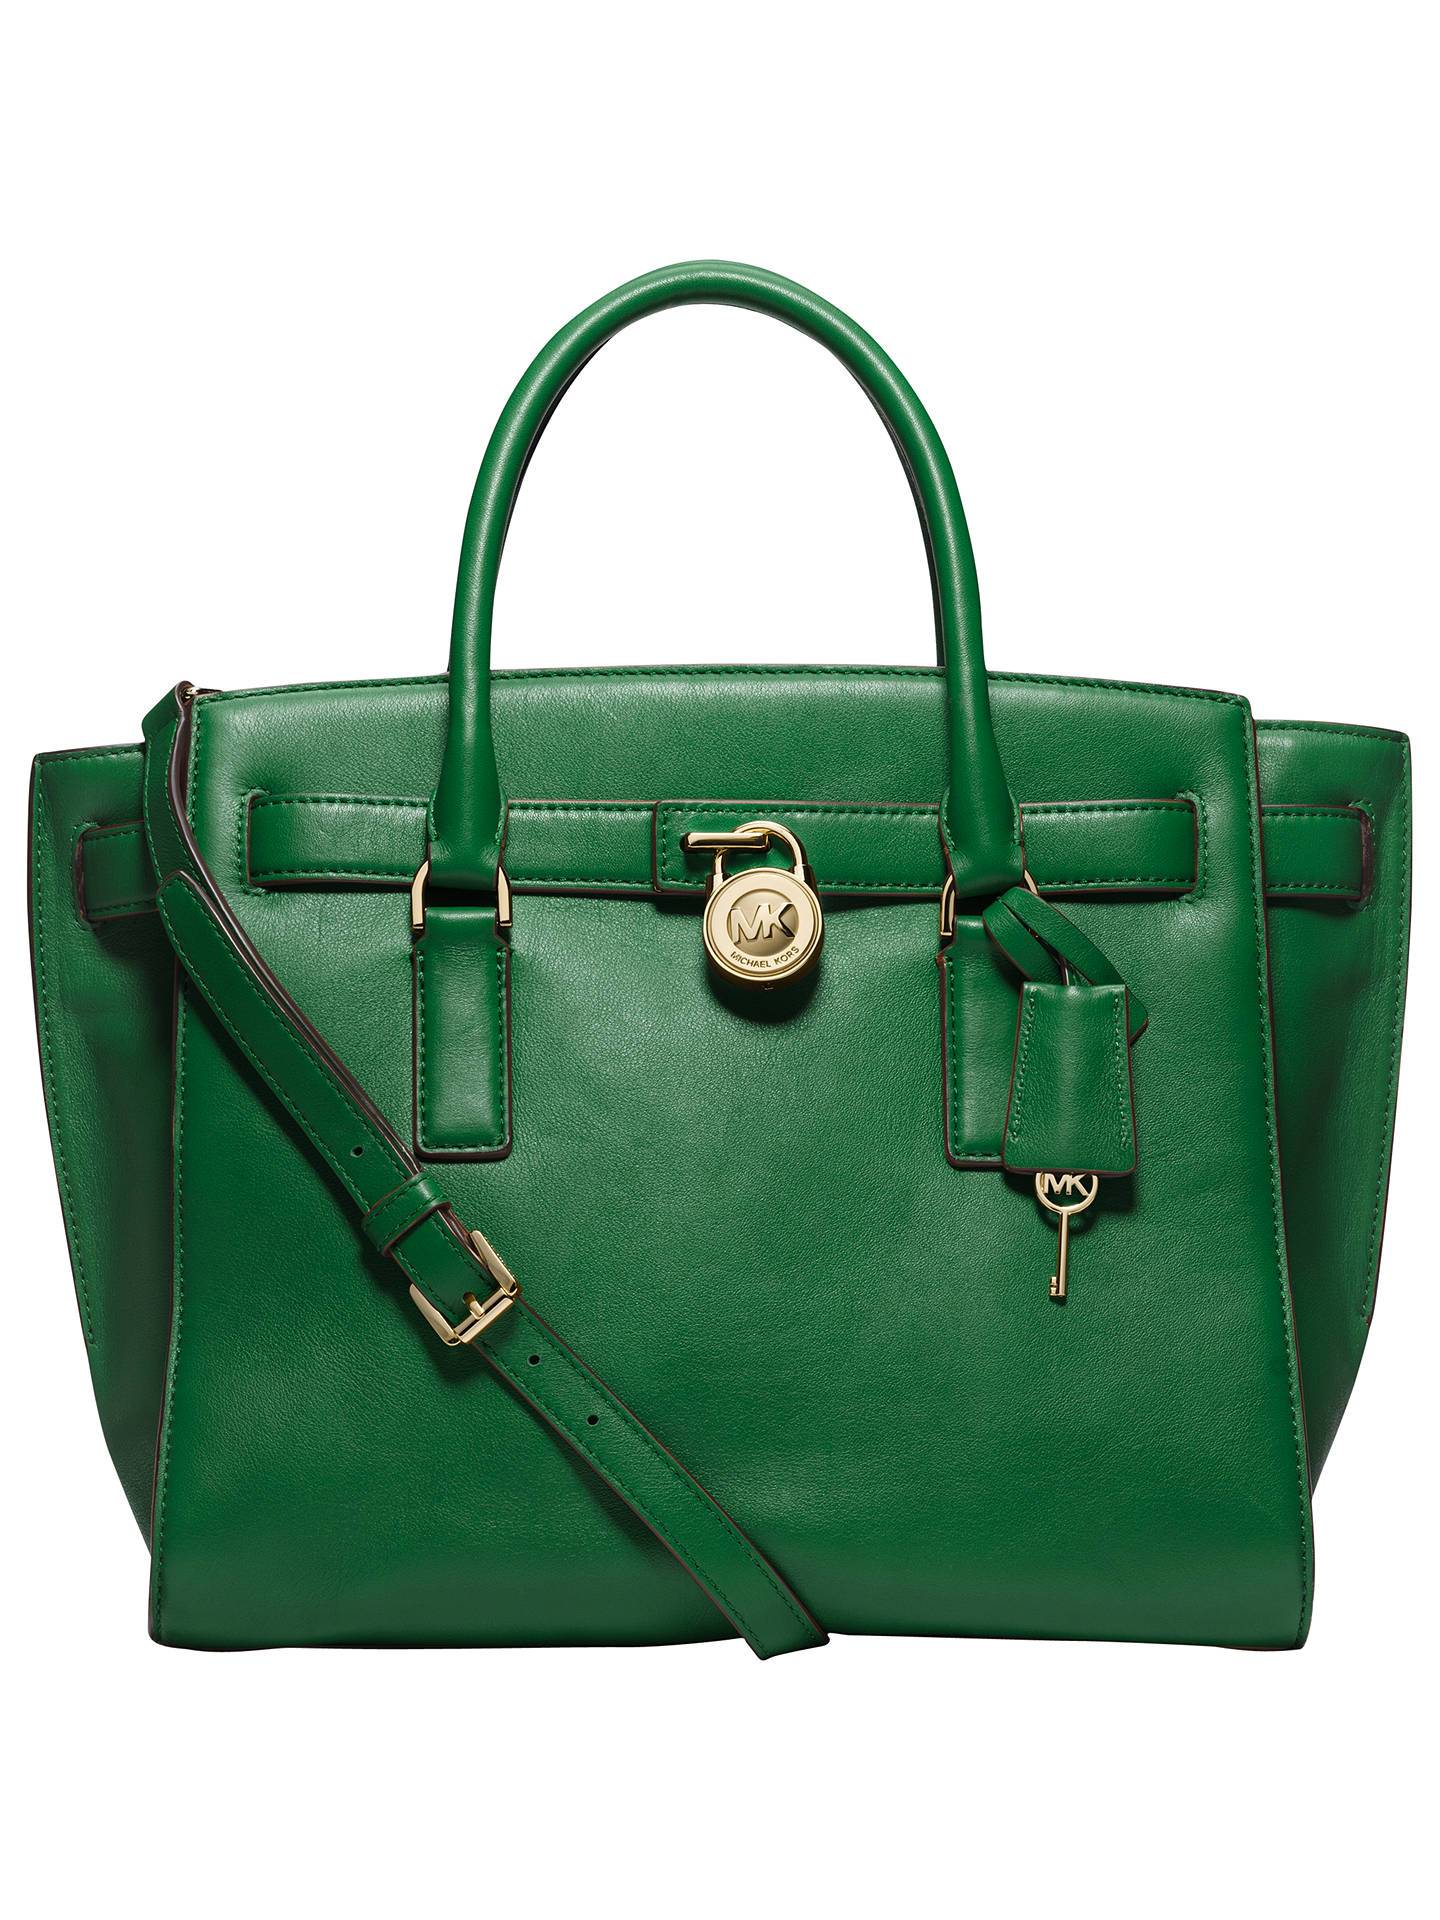 27d53888584907 Buy MICHAEL Michael Kors Hamilton Large Traveller Leather Tote Bag, Green  Online at johnlewis.